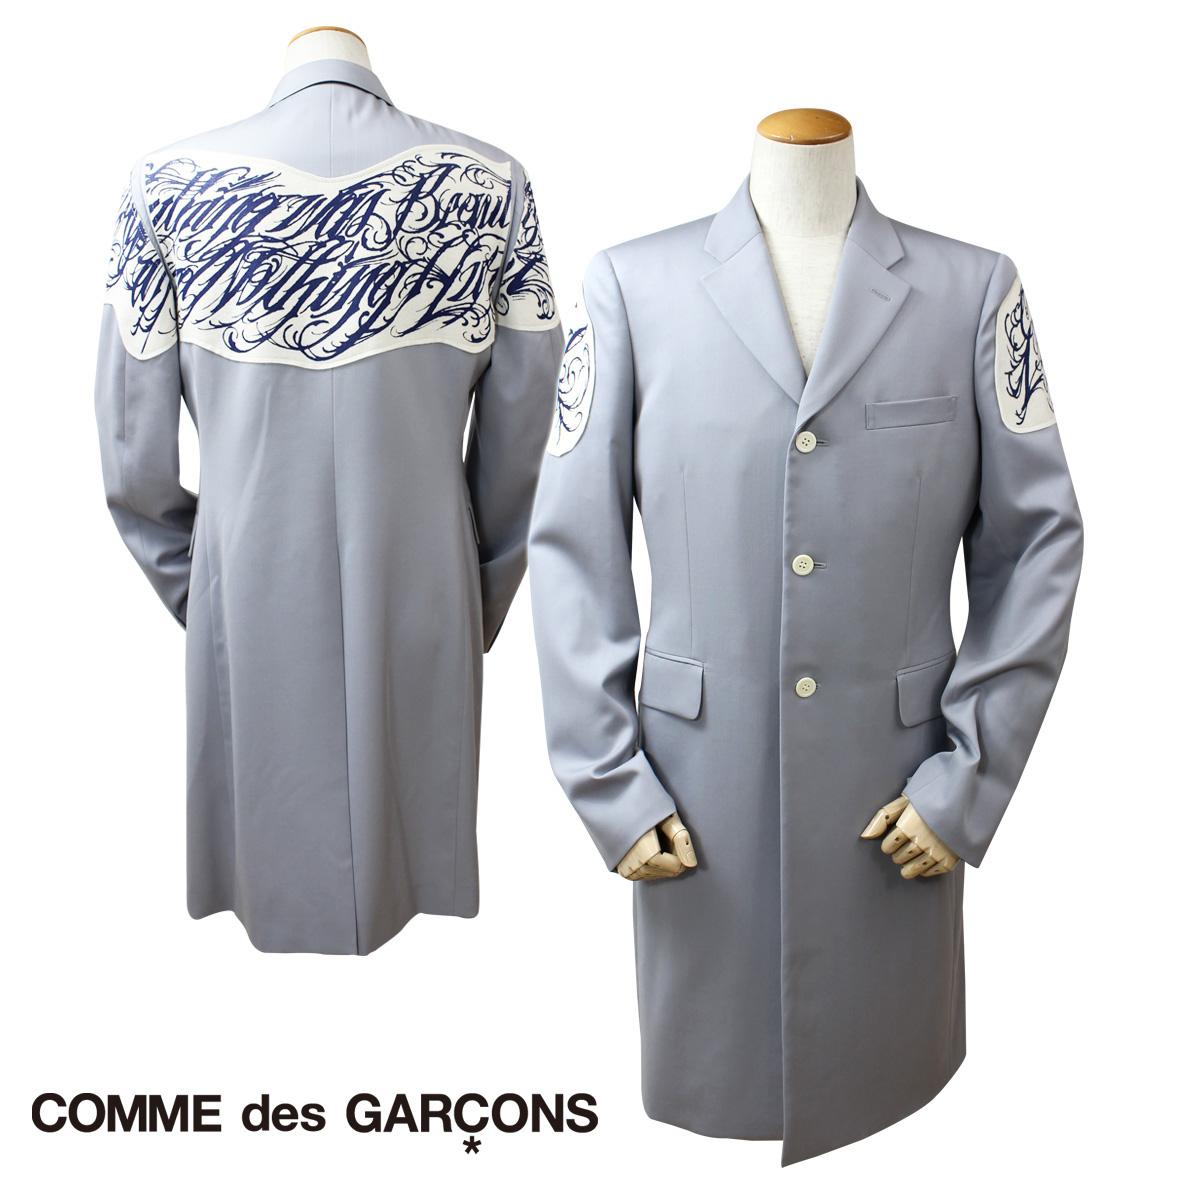 COMME des GARCONS HOMME PLUS コムデギャルソン ジャケット ロングコート グレー メンズ 【決算セール 返品不可】